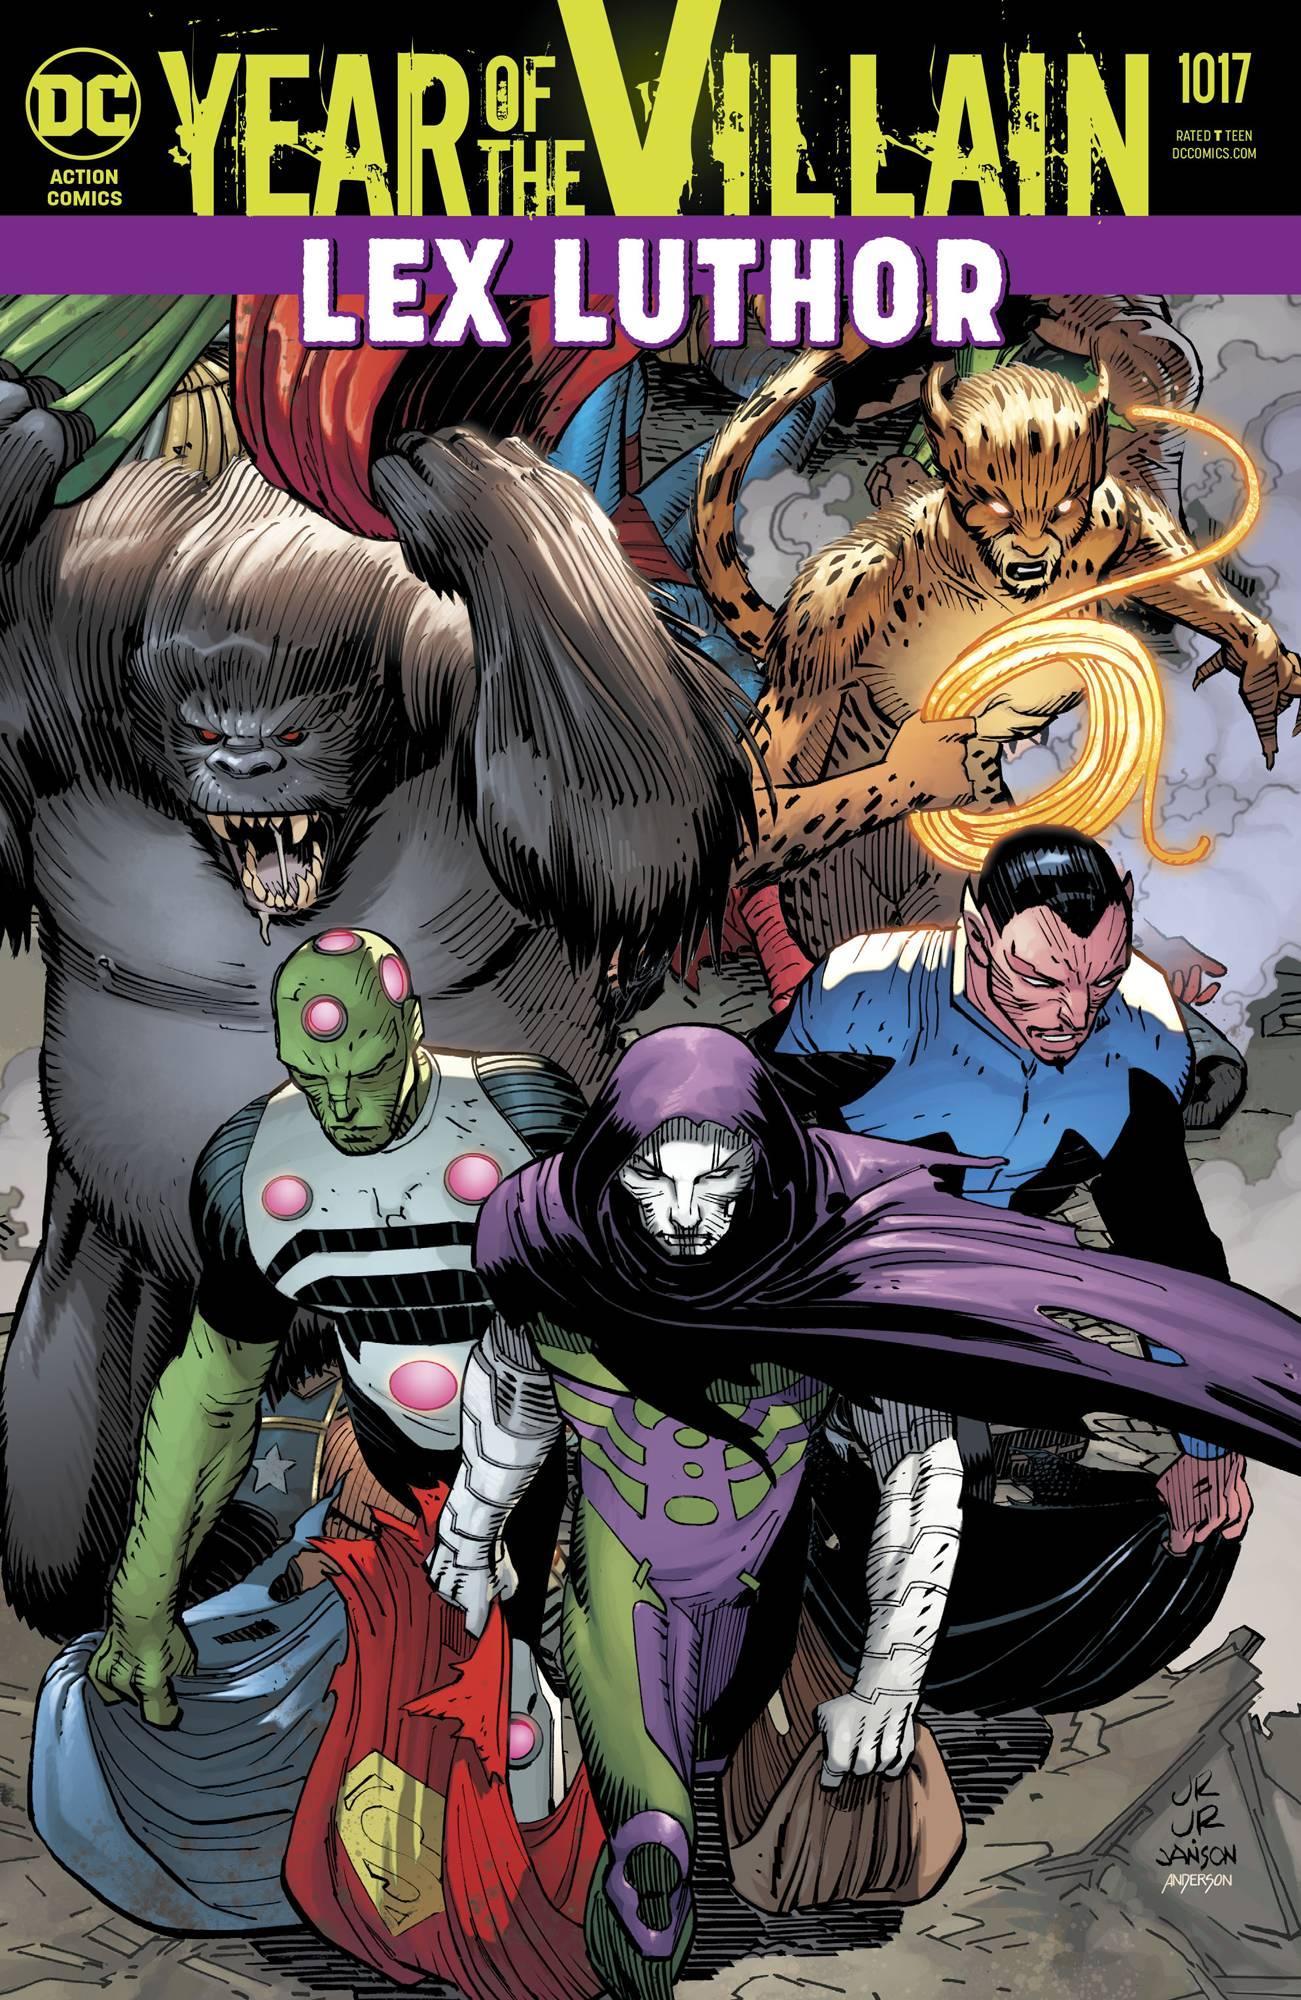 Action Comics #1017 (2019)